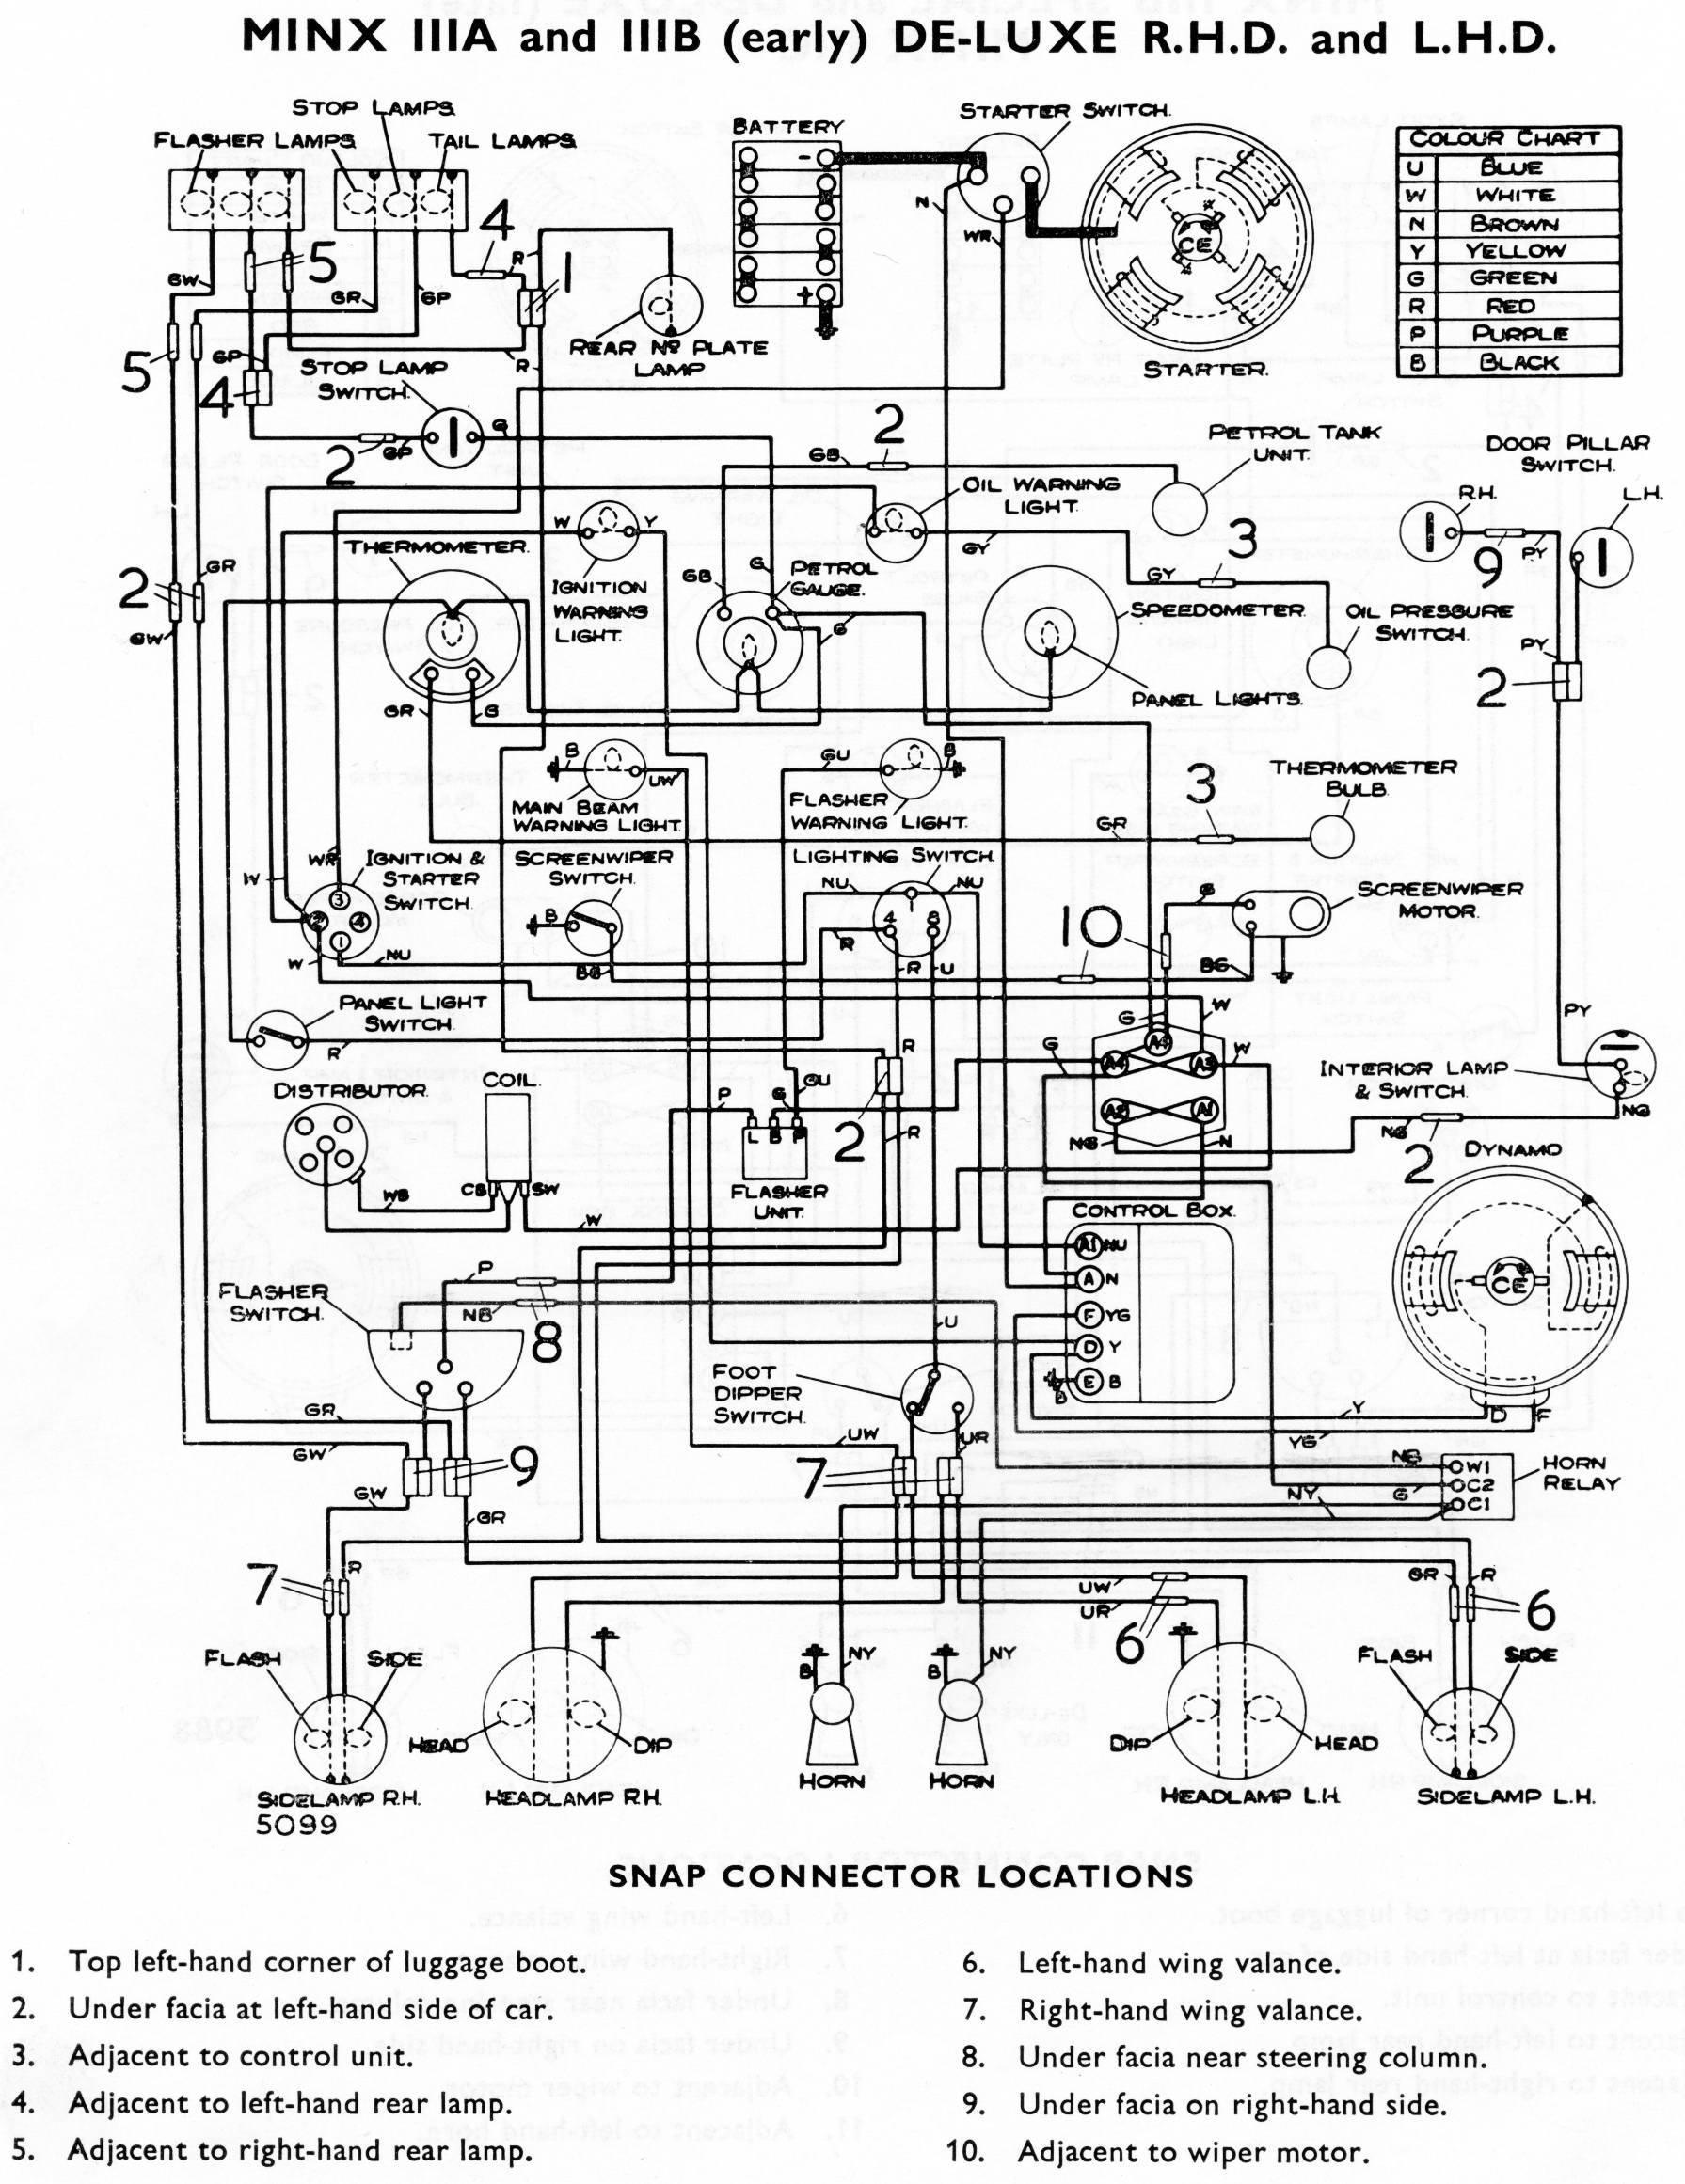 Nissan Skyline R33 Wiring Diagram